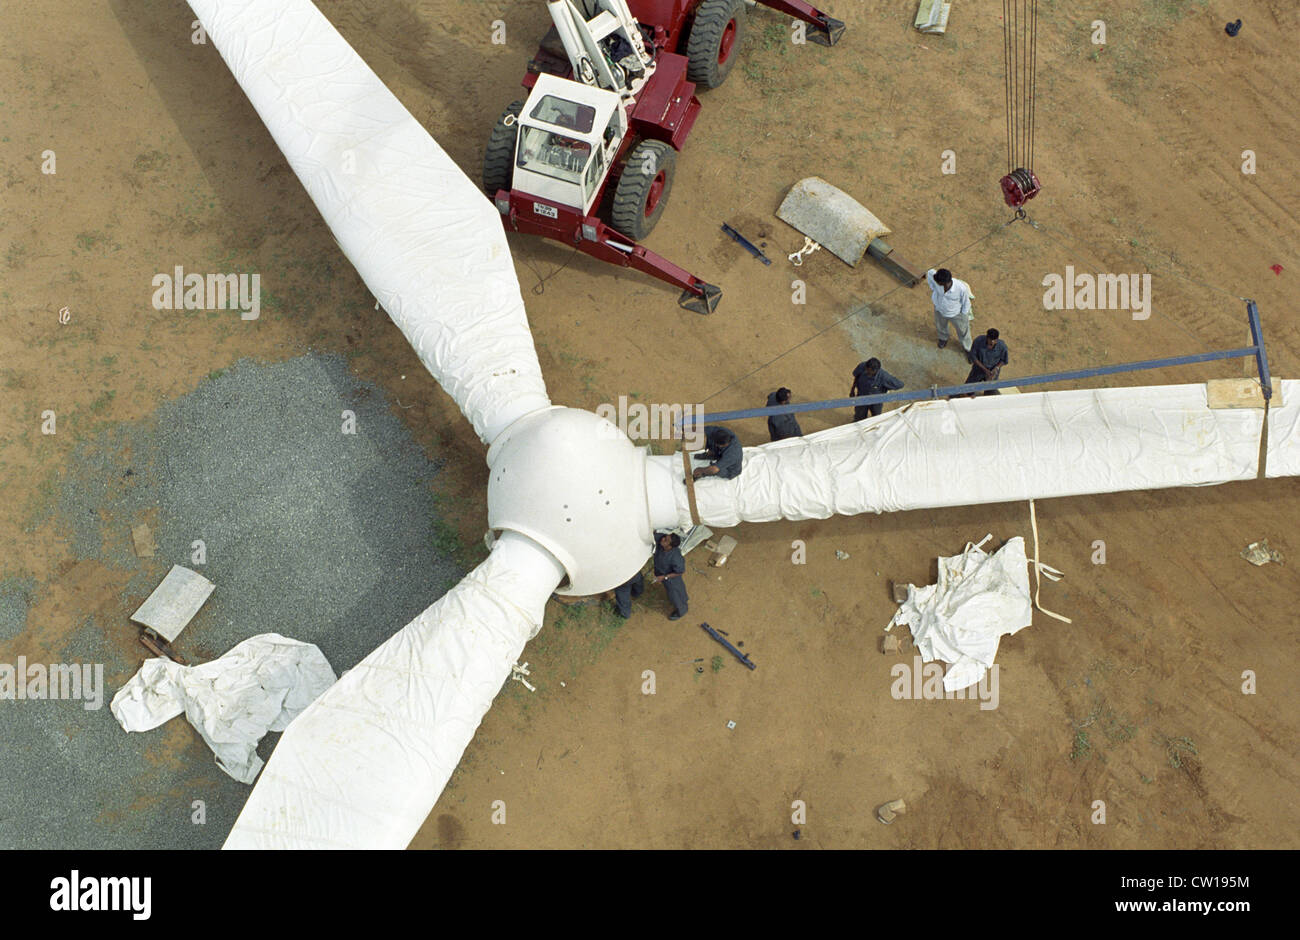 INDIA Tamil Nadu Kannyakumari Cape Comorin , construction site of Vestas RBB rotor blades for wind turbines Stock Photo